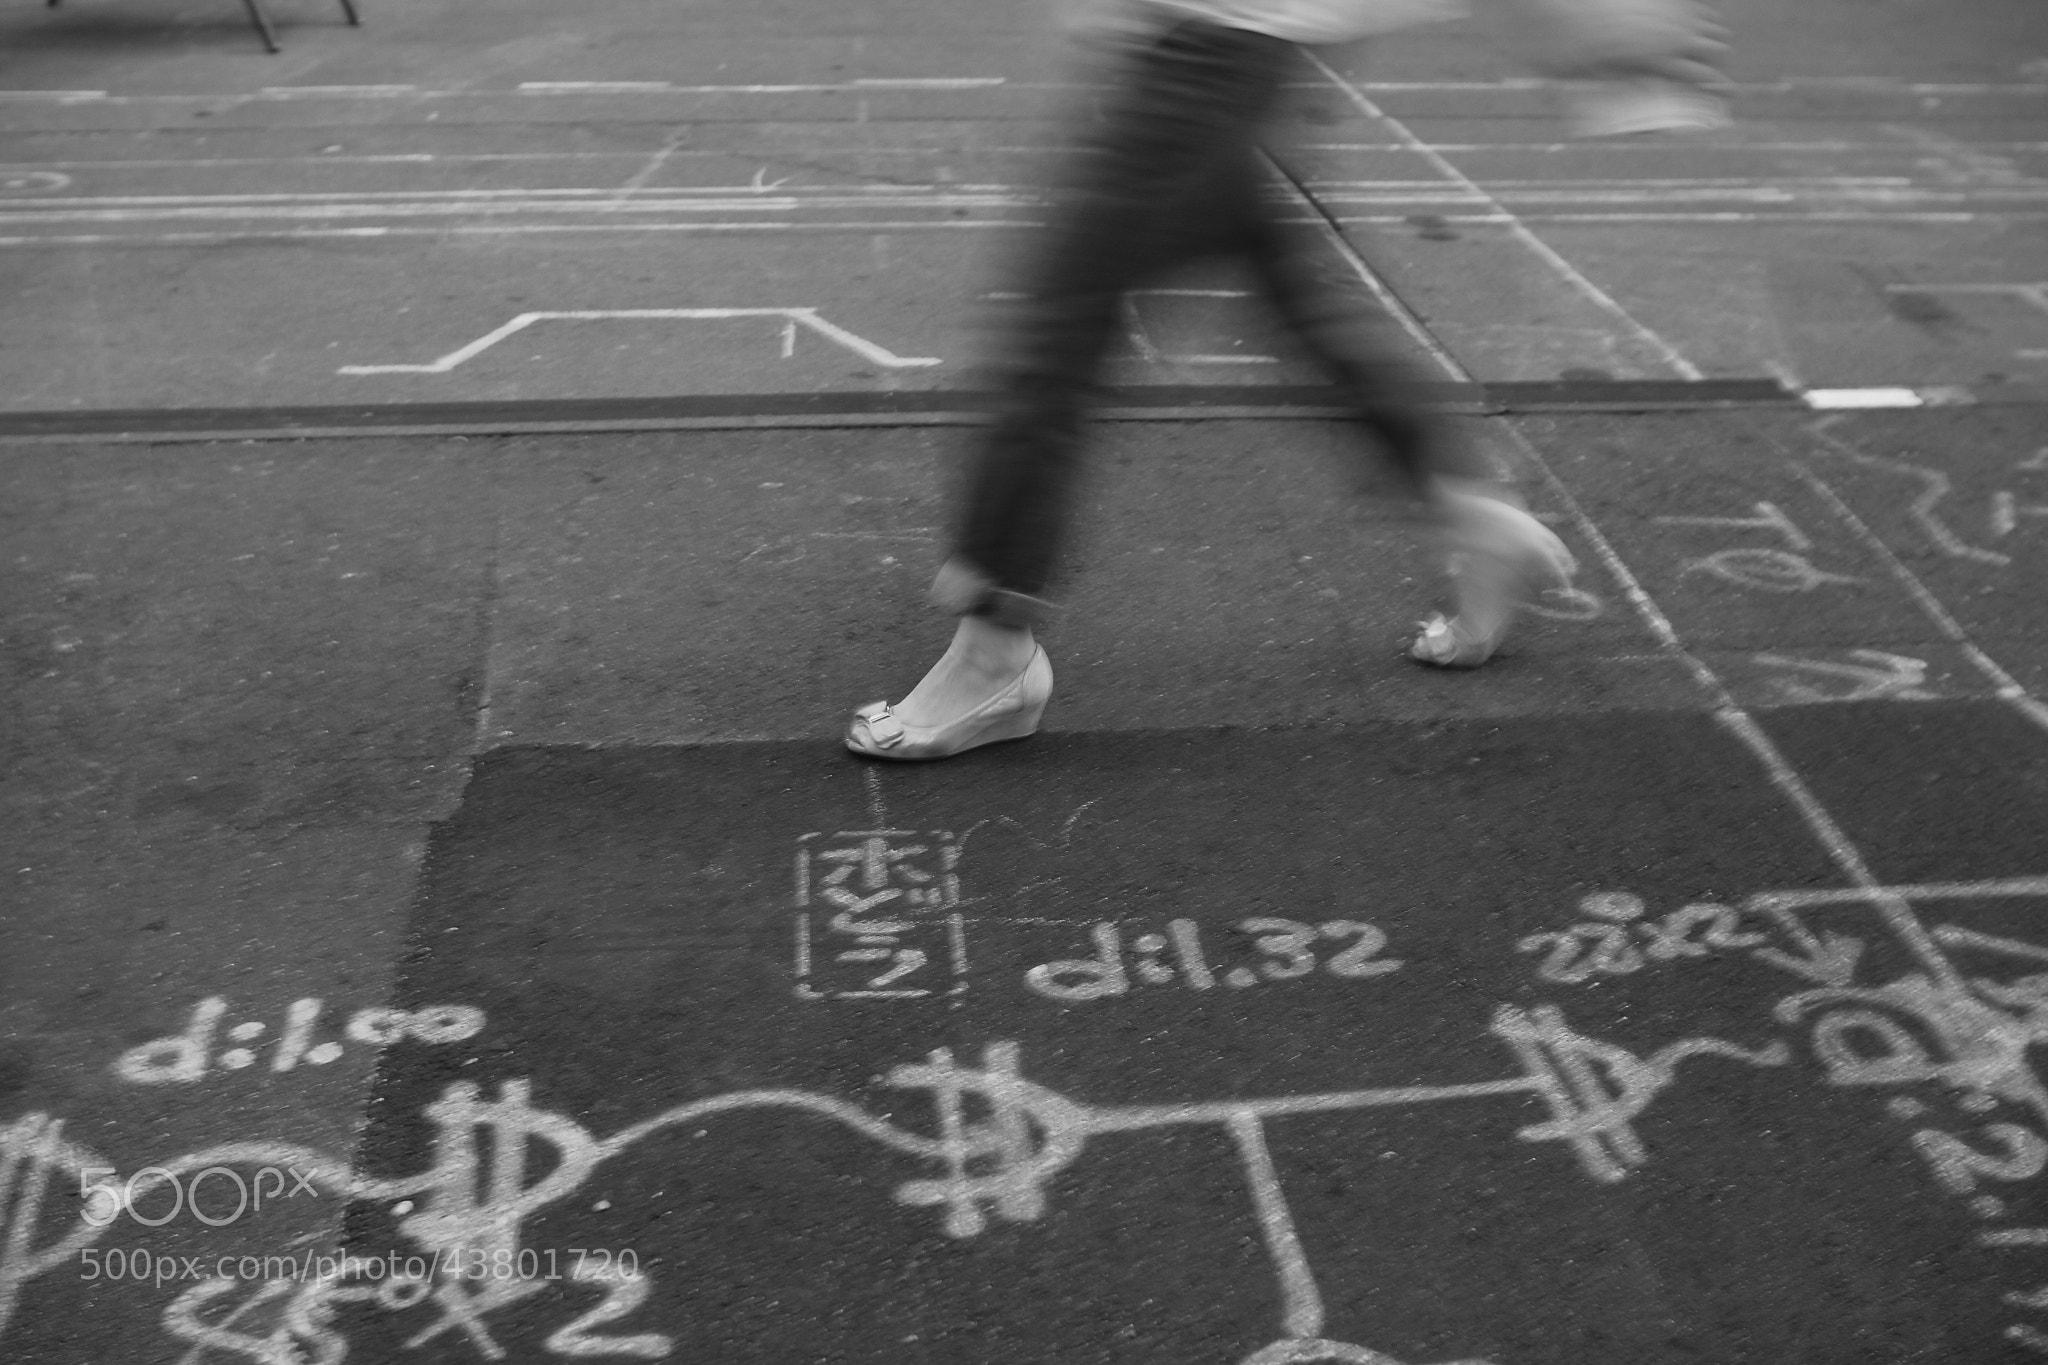 Photograph Footprint by Tsutomu Hashimoto on 500px